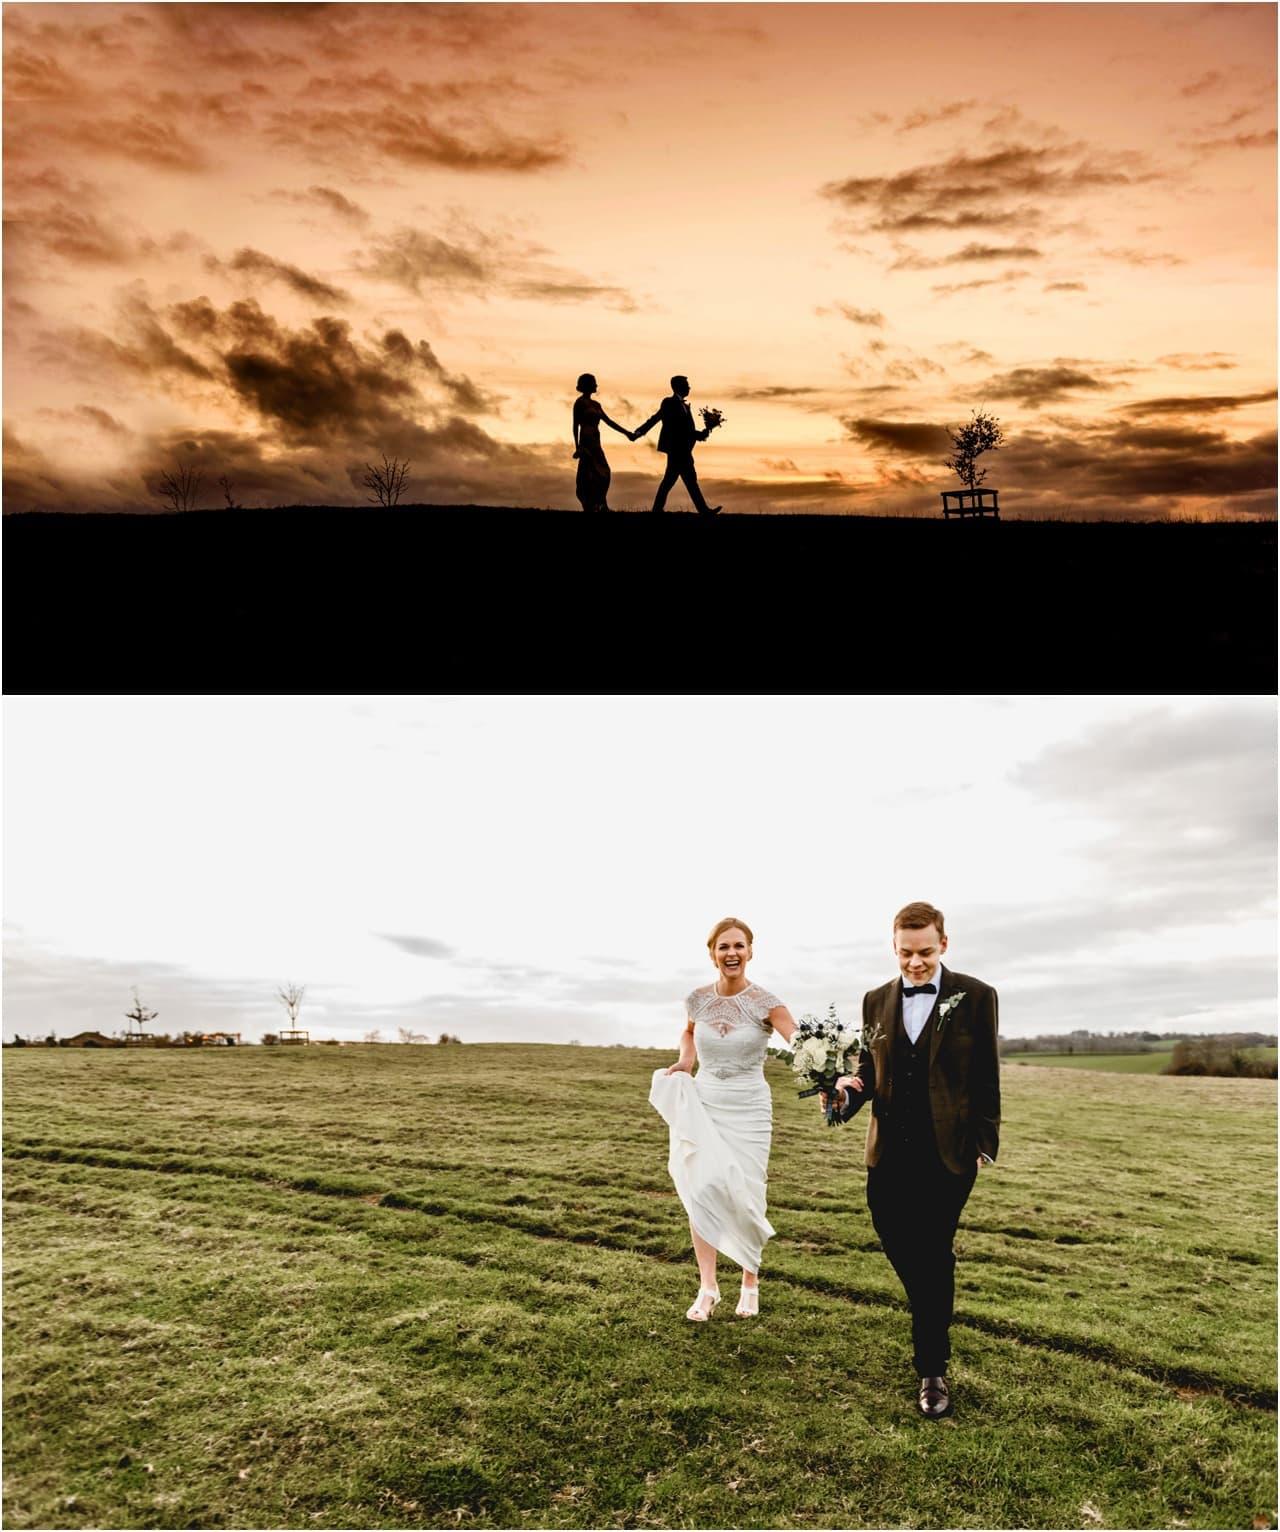 Bride And Groom Enjoying Amazing Sunset On A Beautiful: Dodford Manor Wedding - Katy And Josh